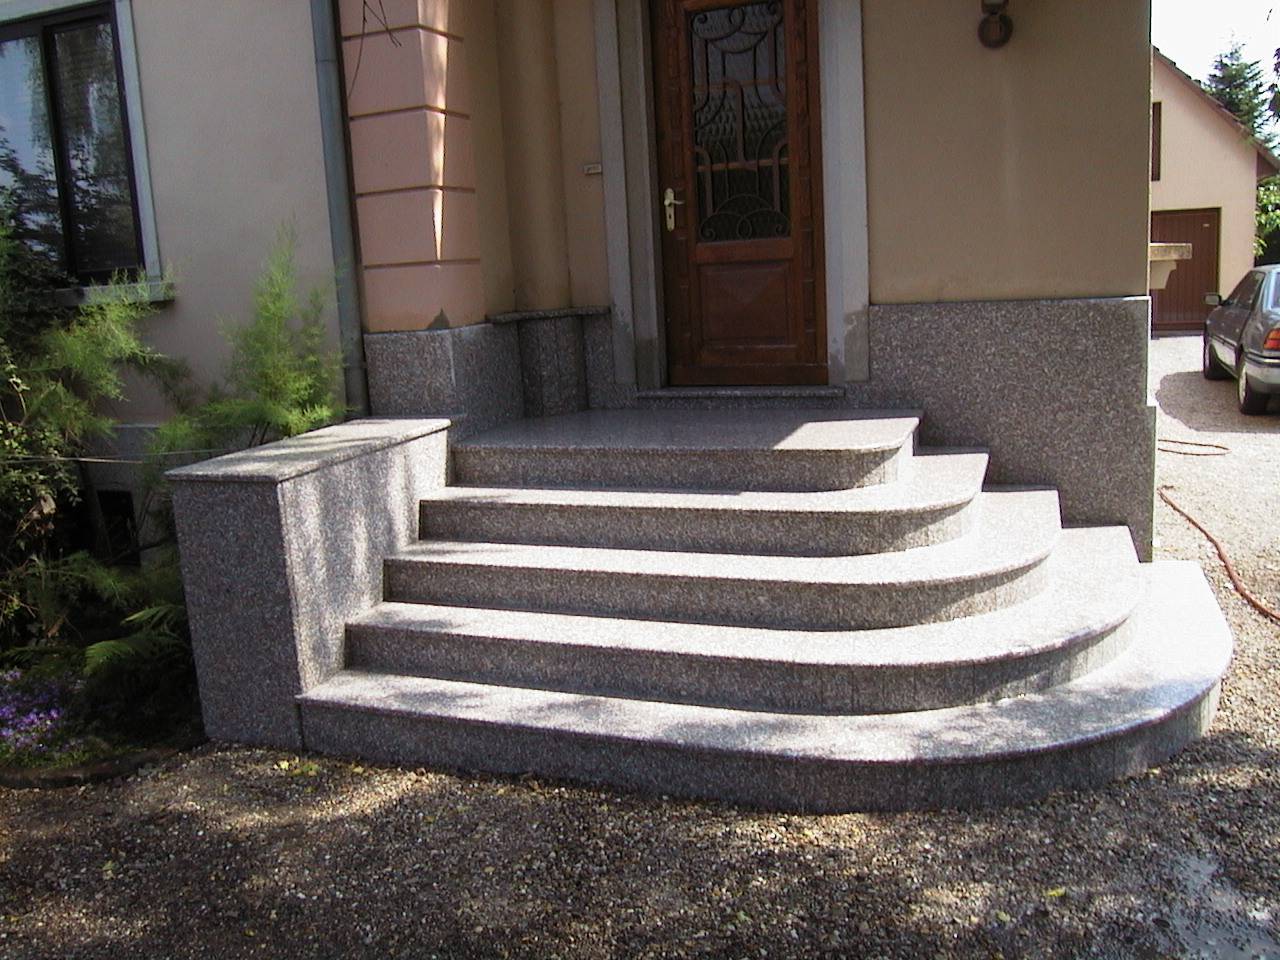 escalier pyramidale granit, escalier virage granit alsace